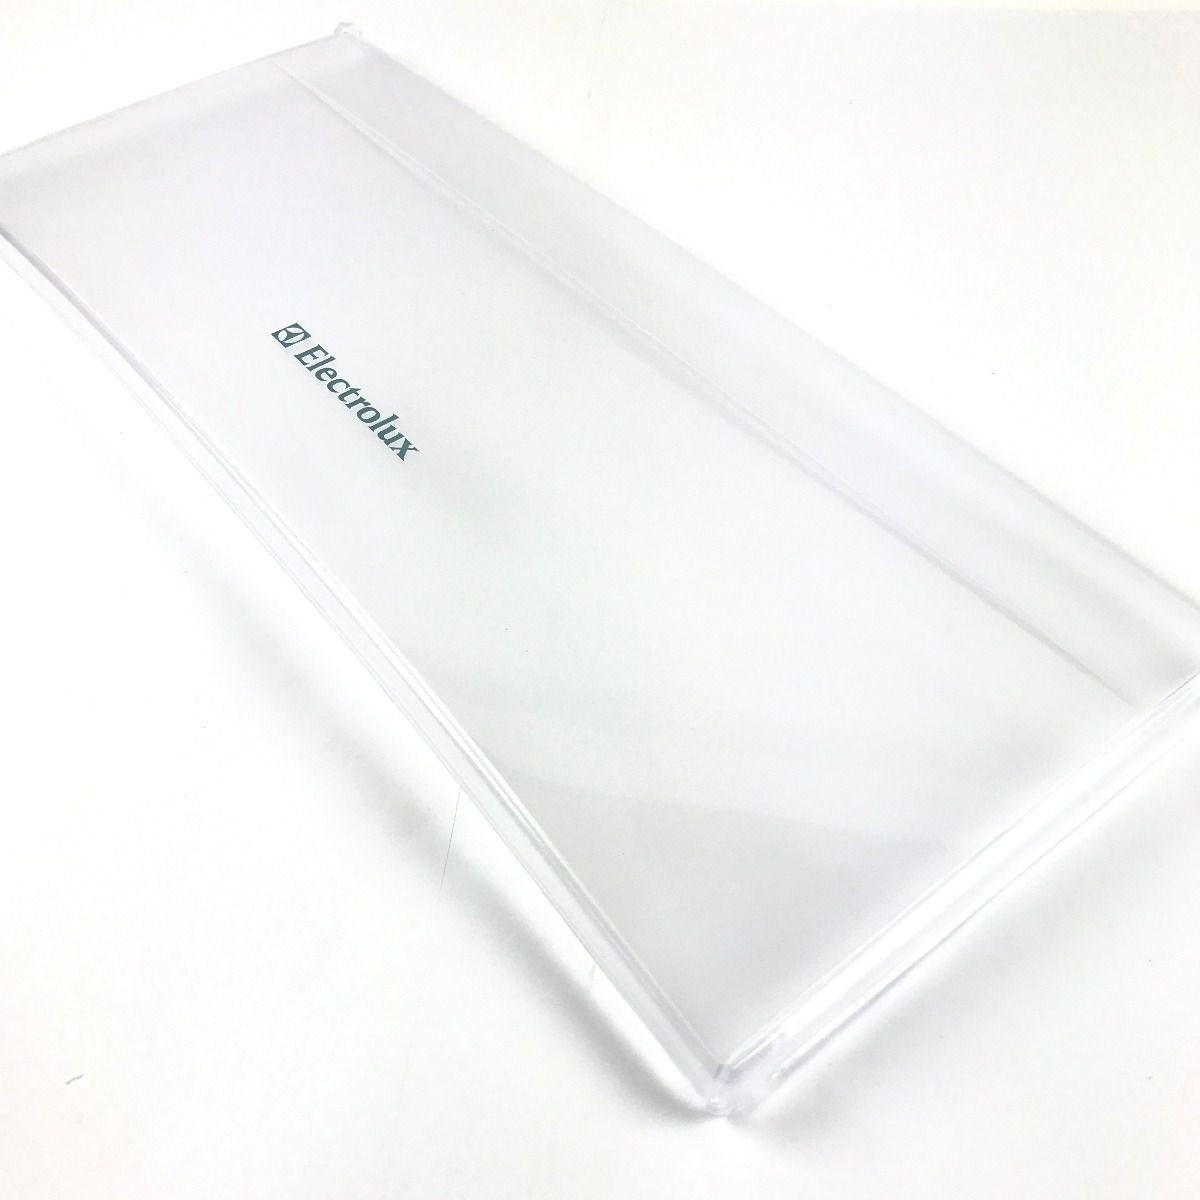 Porta Basculante Freezer Vertical Fe18 Electrolux 77187483